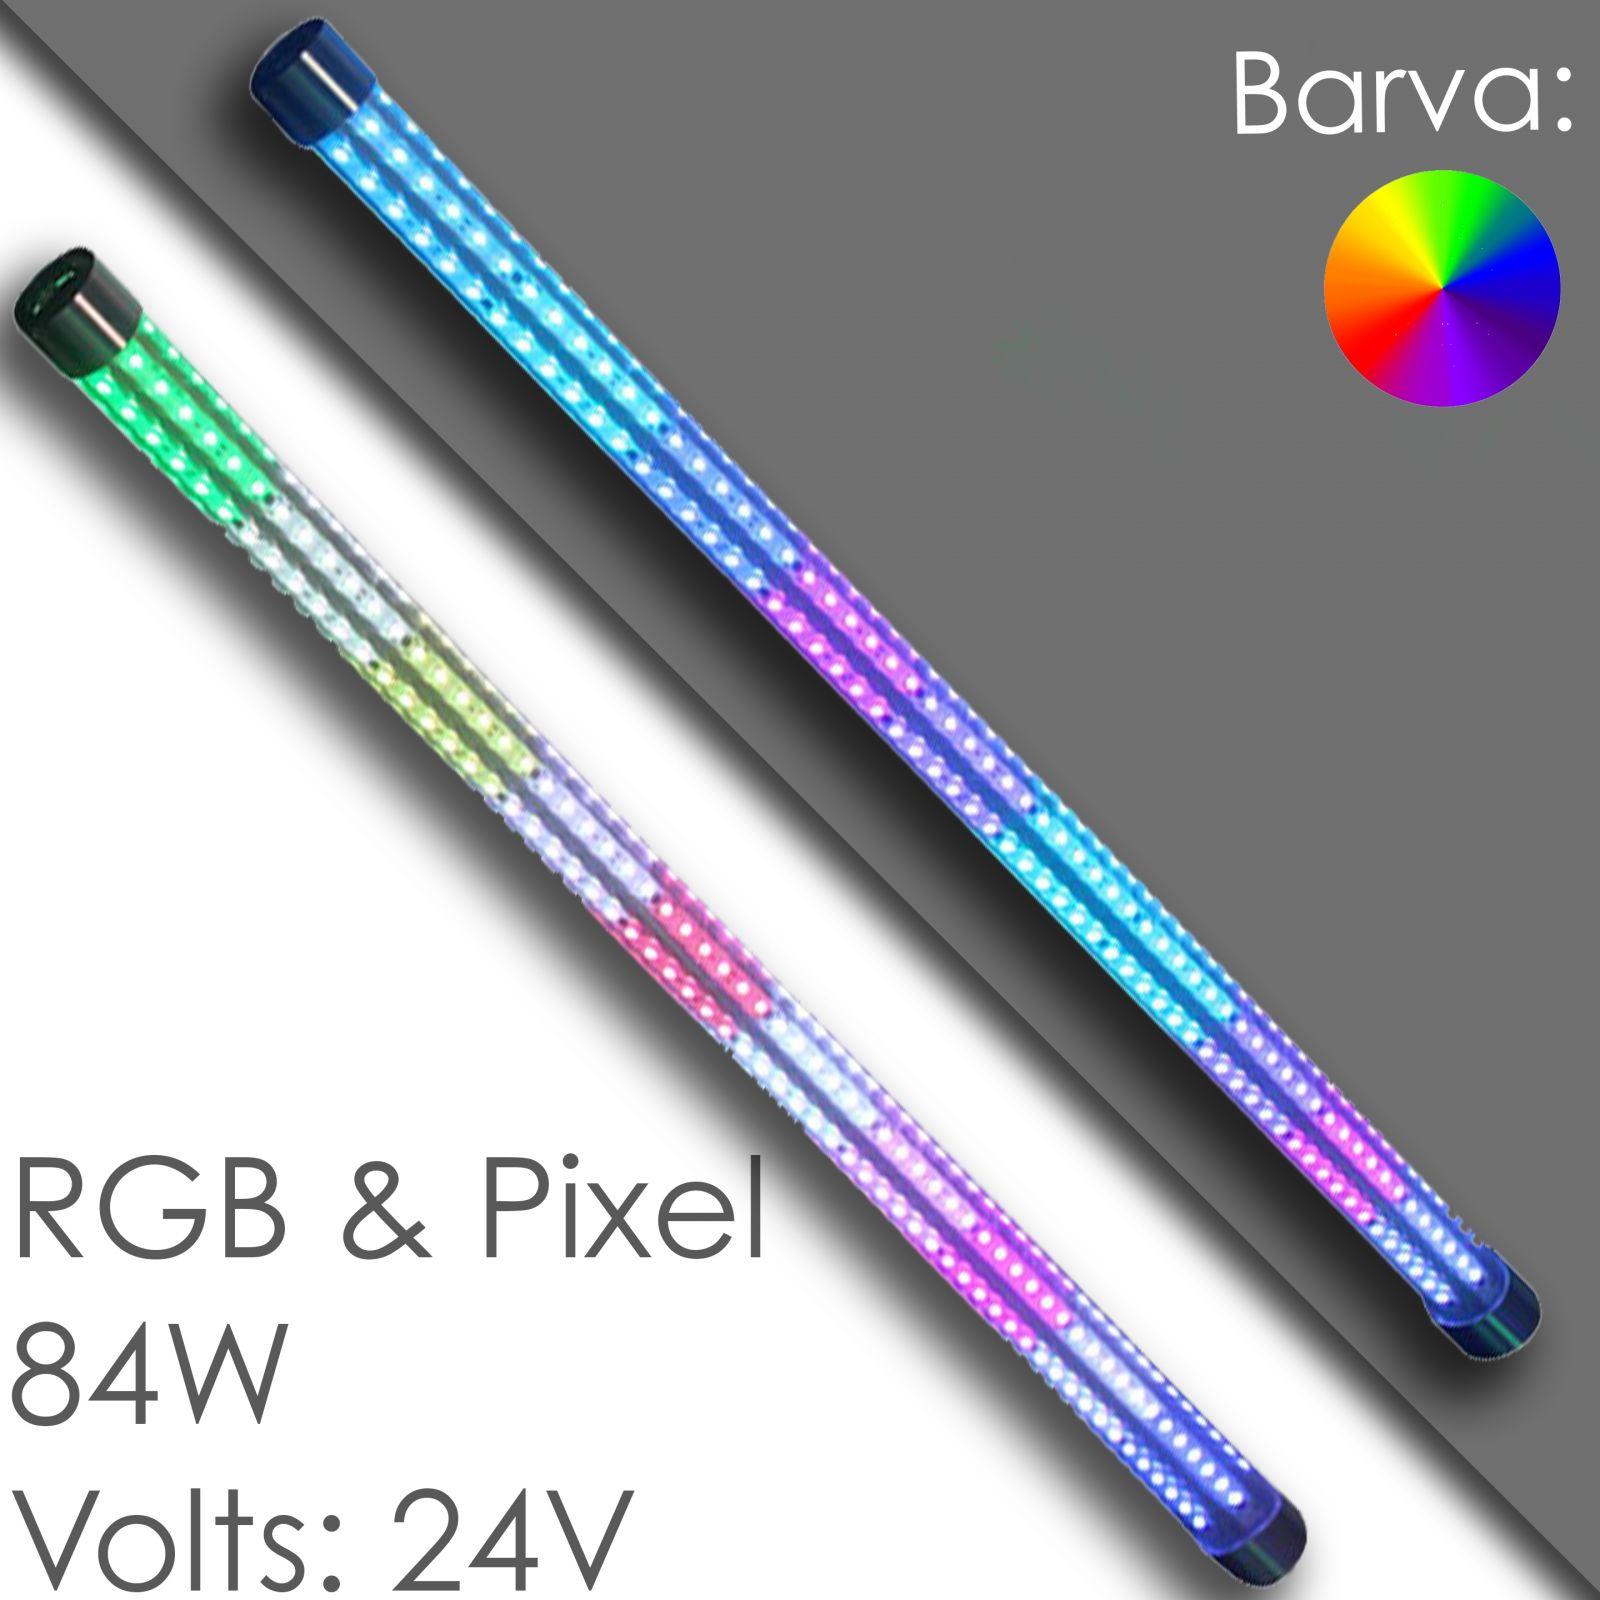 Led tube bumper cars - RGB / Pixel, waterproof